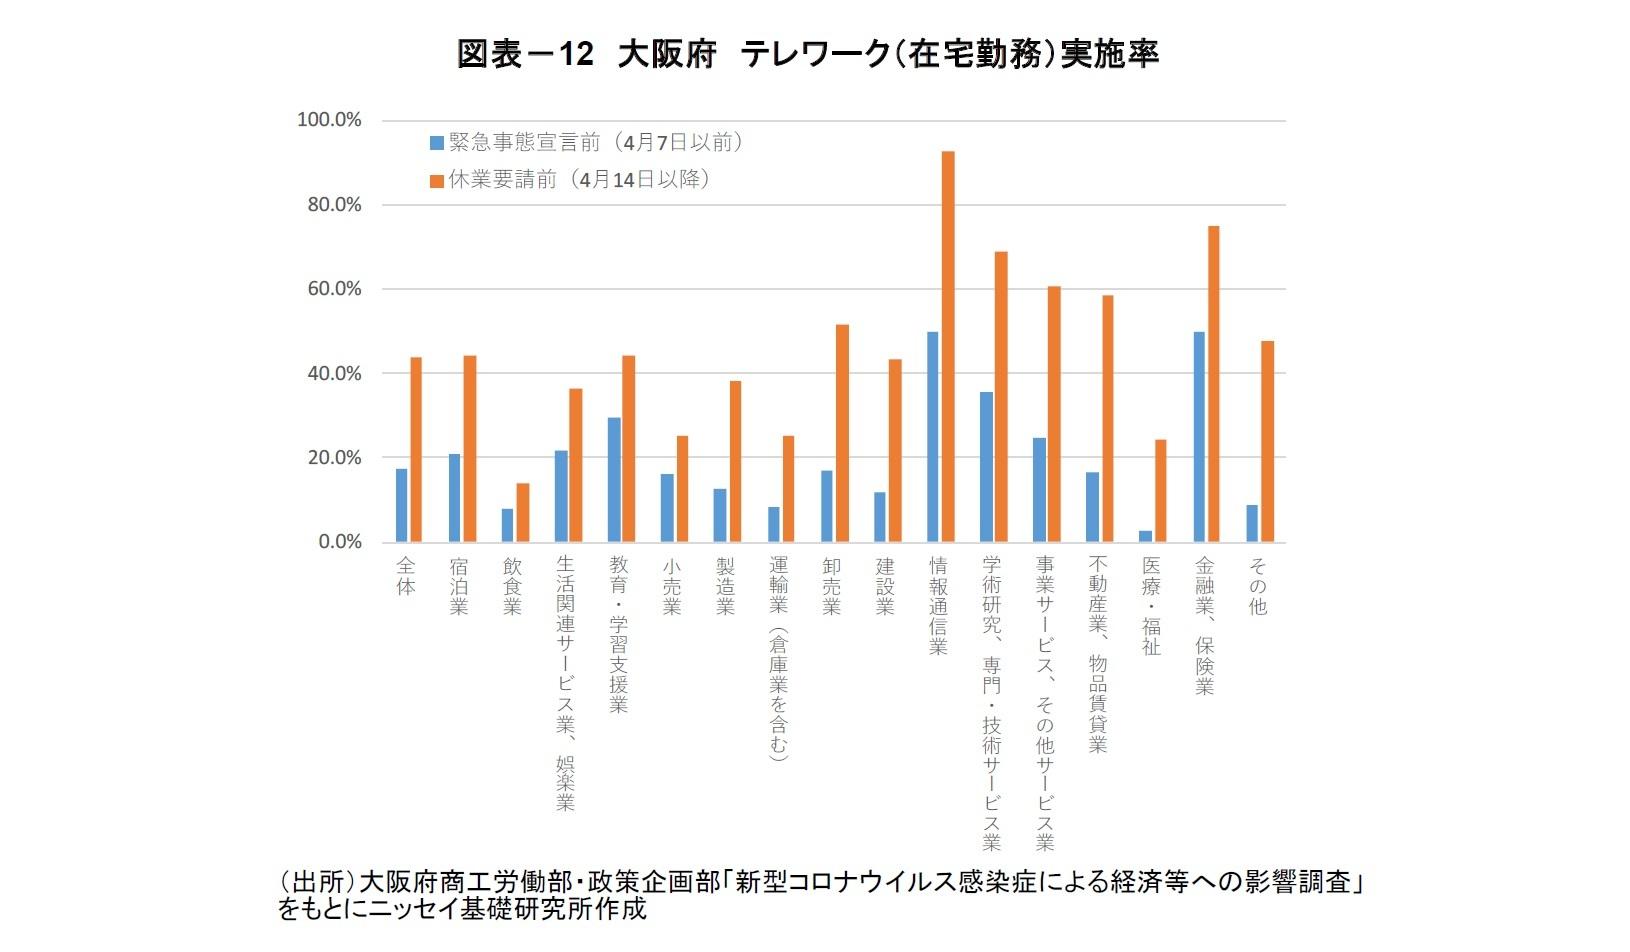 図表-12 大阪府 テレワーク(在宅勤務)実施率